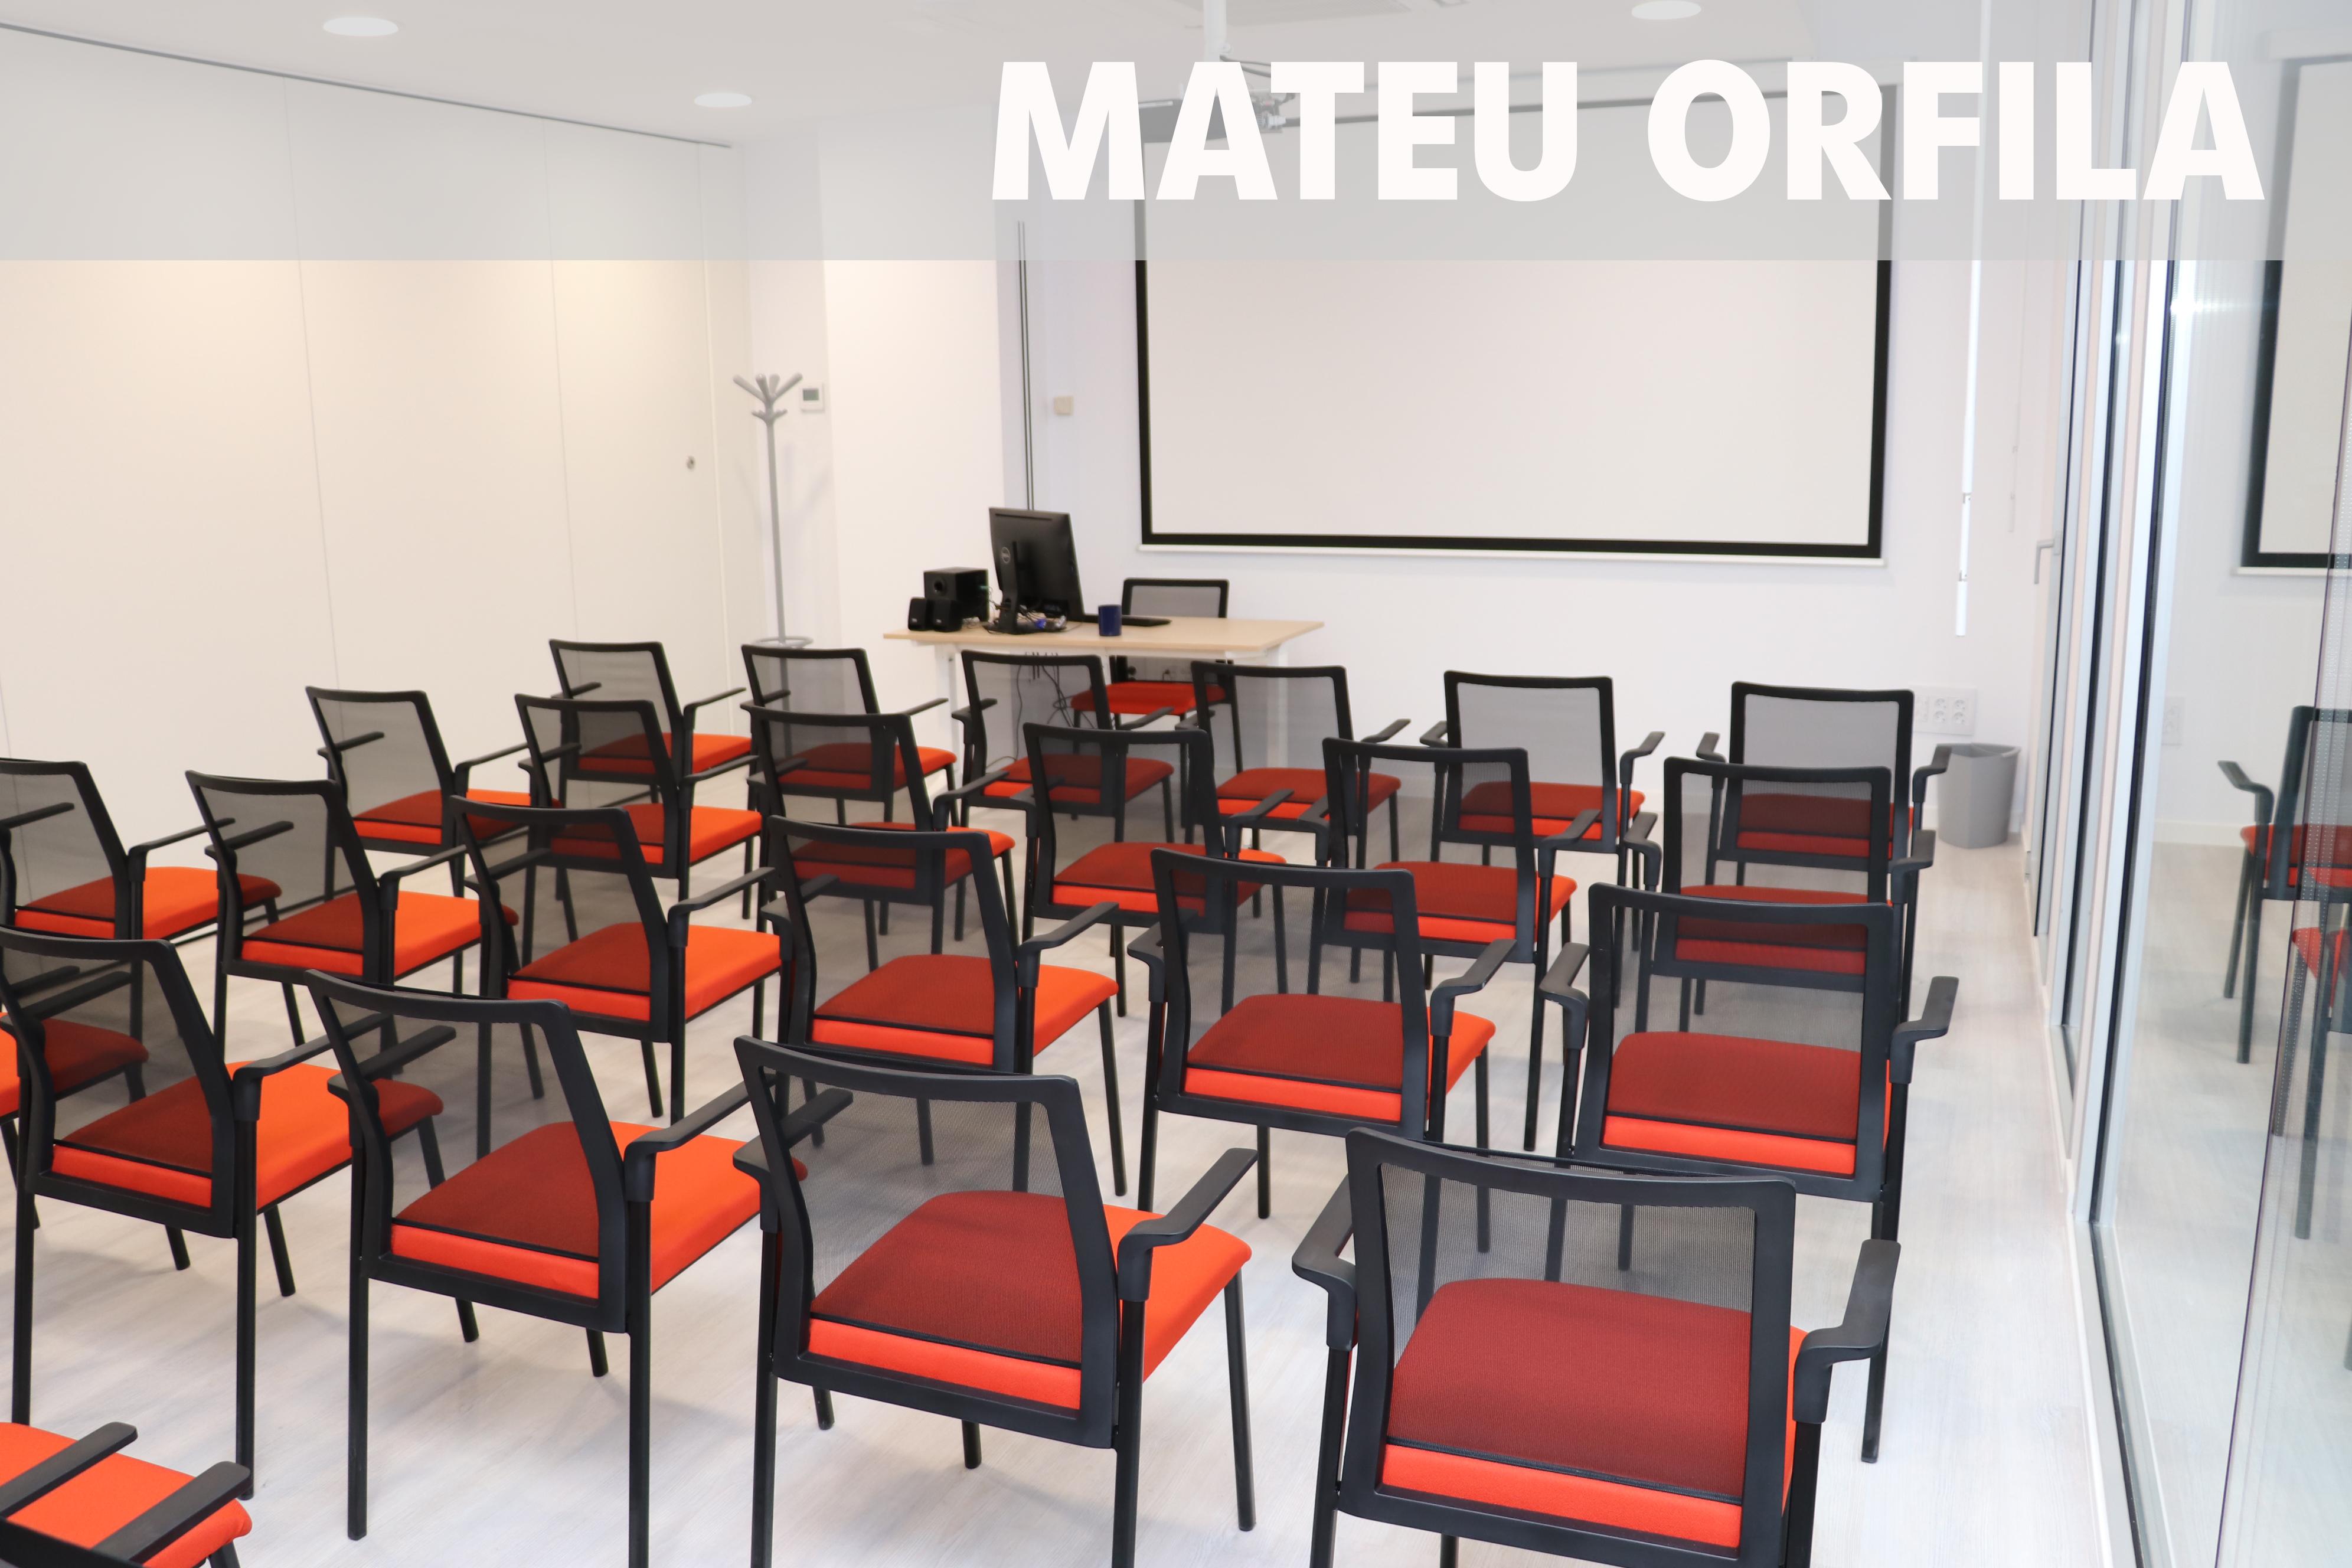 Sala Mateo Orfila 3 mod